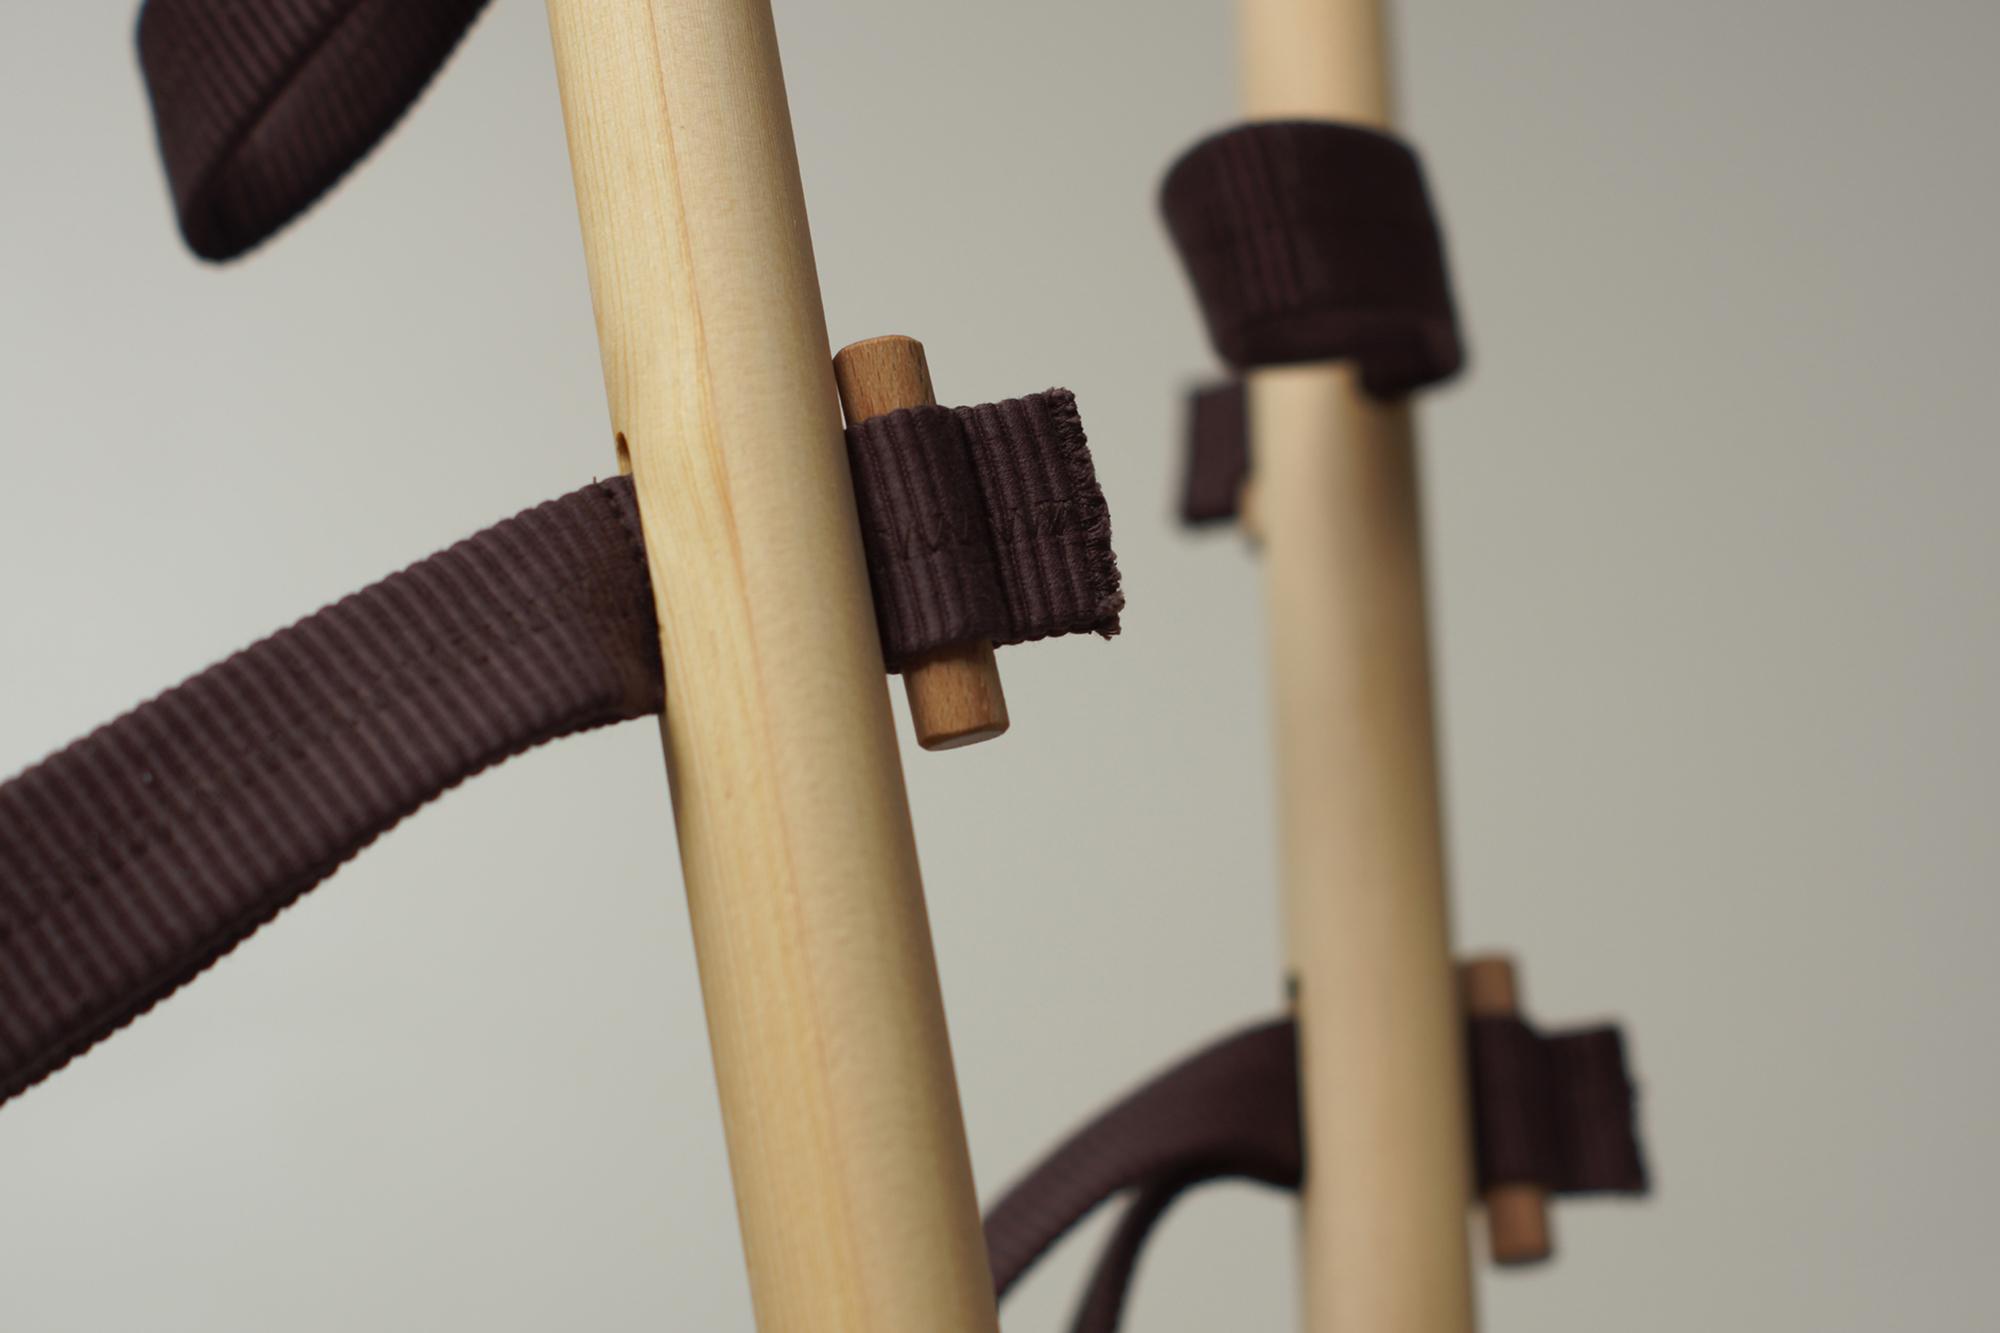 Dezső Ilona - Download Design - Bench with hanger 01.jpg